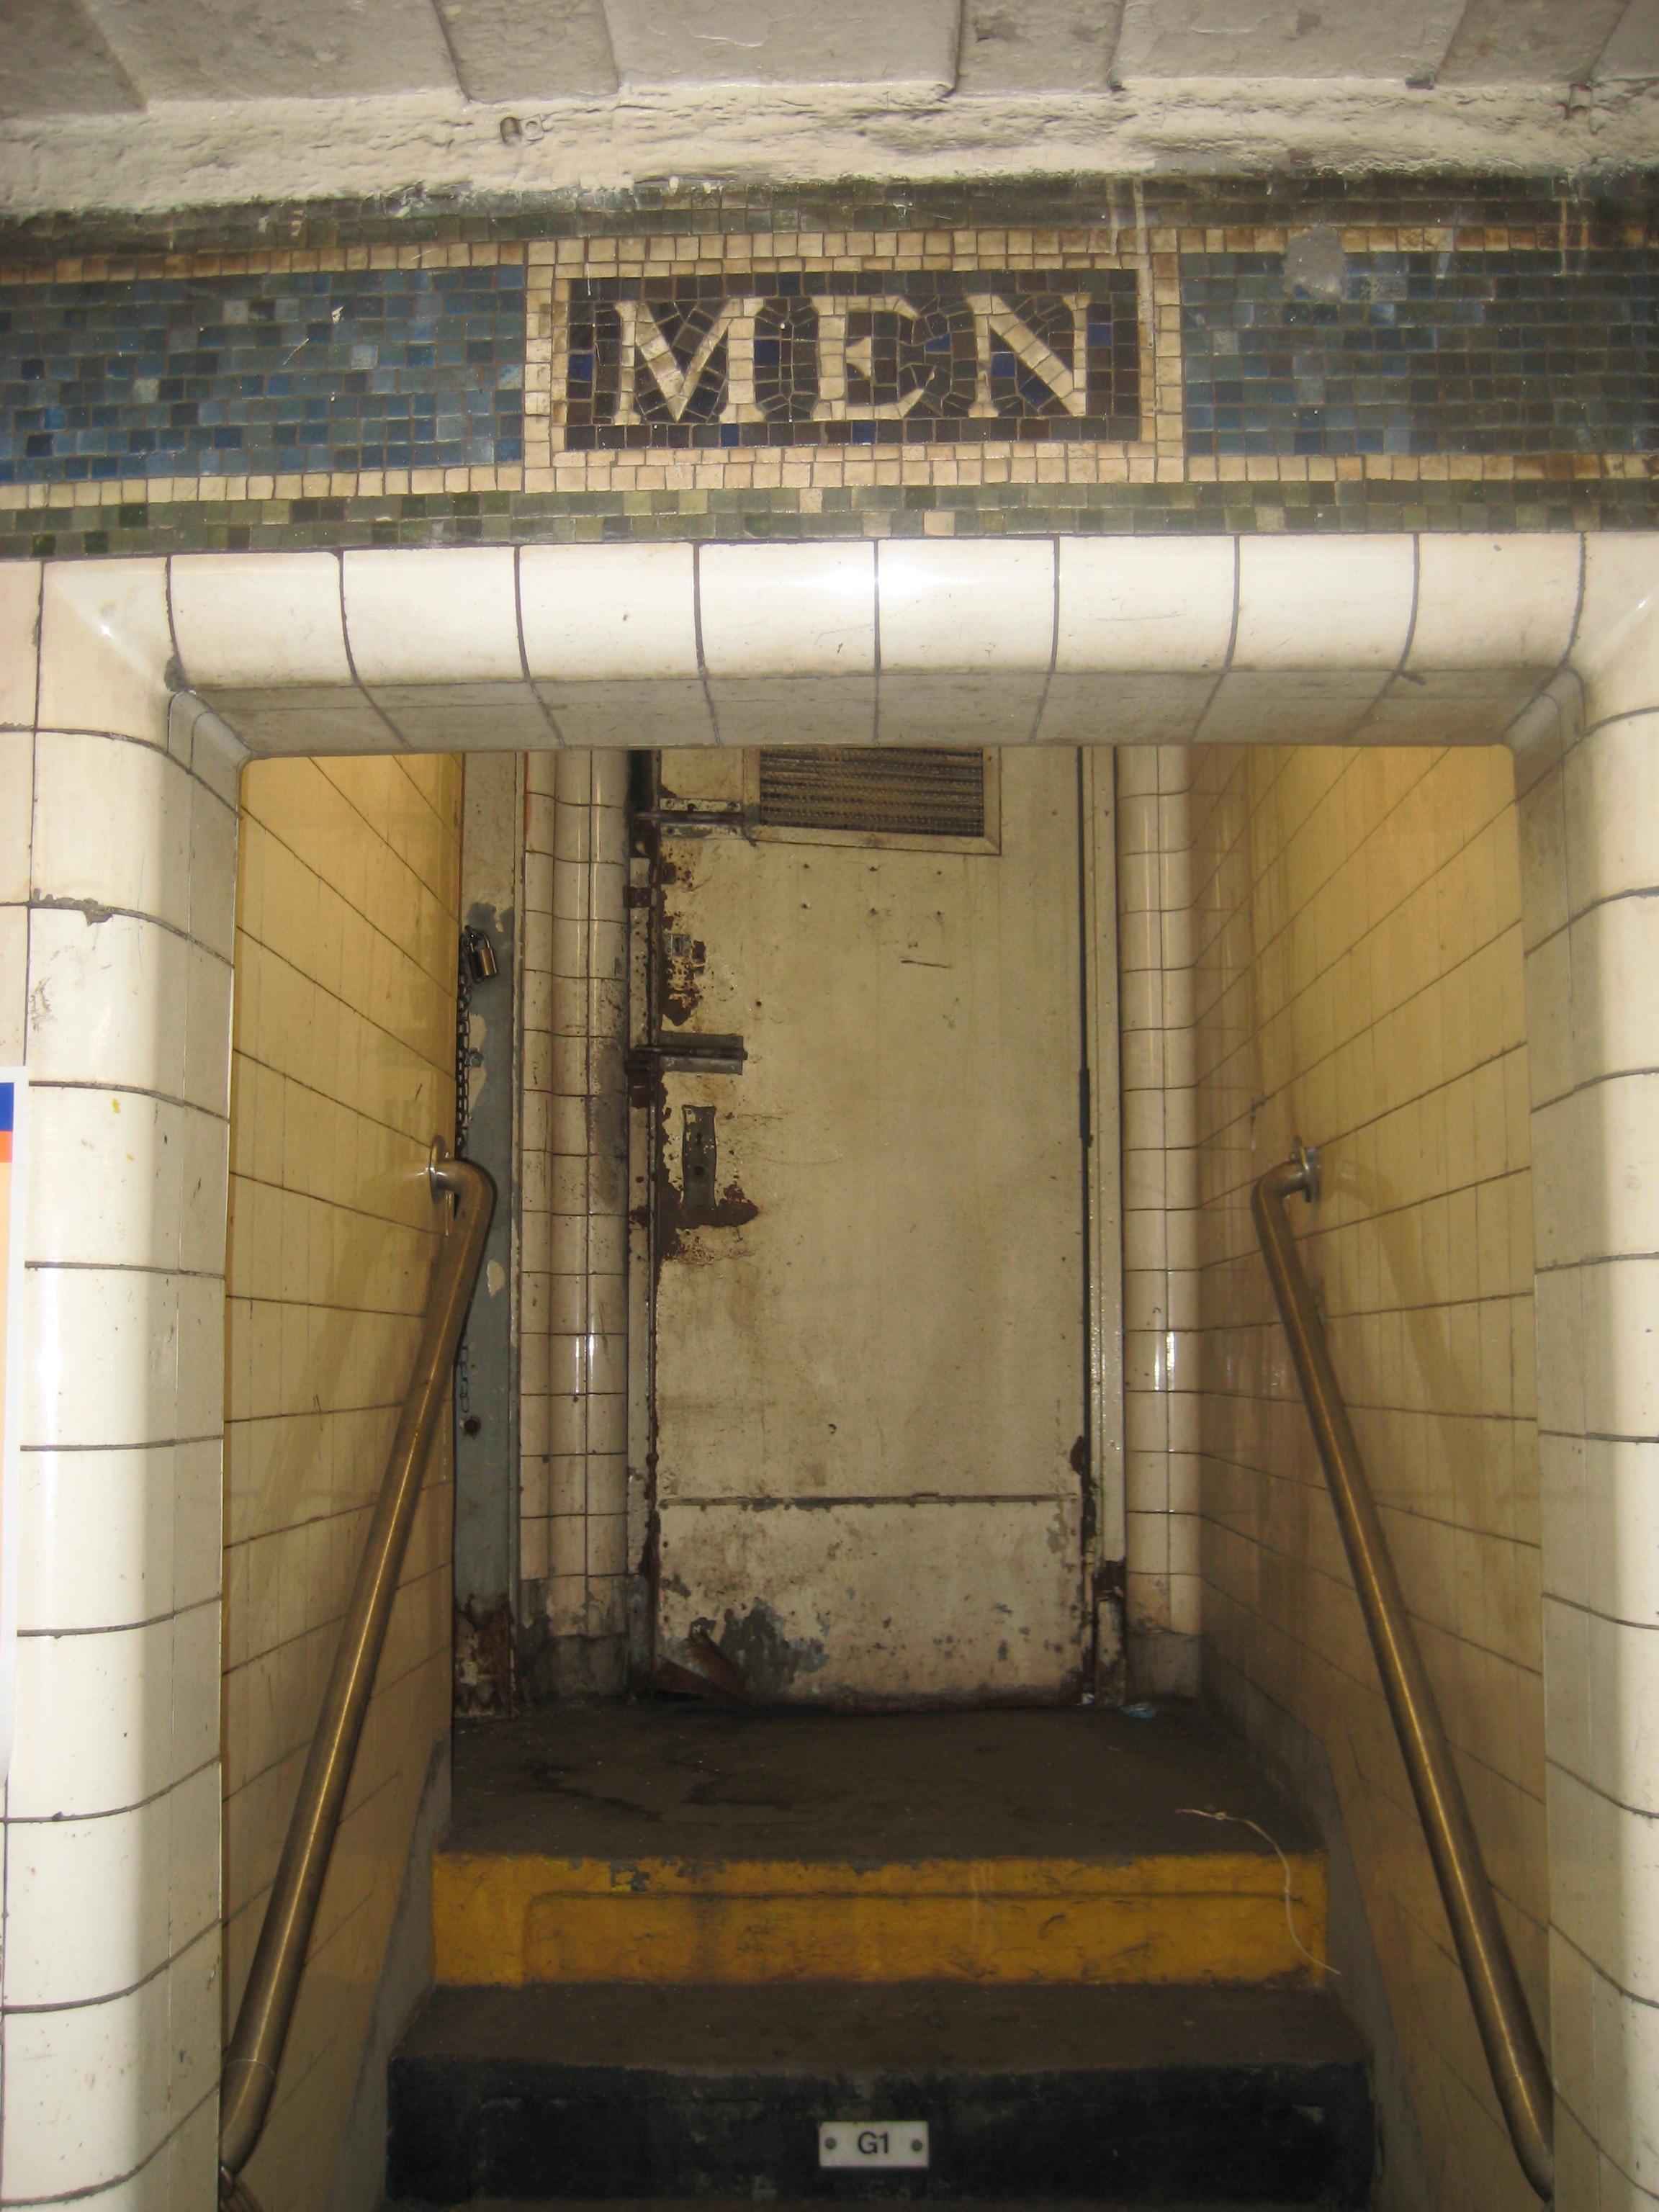 14th Street Subway Station Ephemeral New York